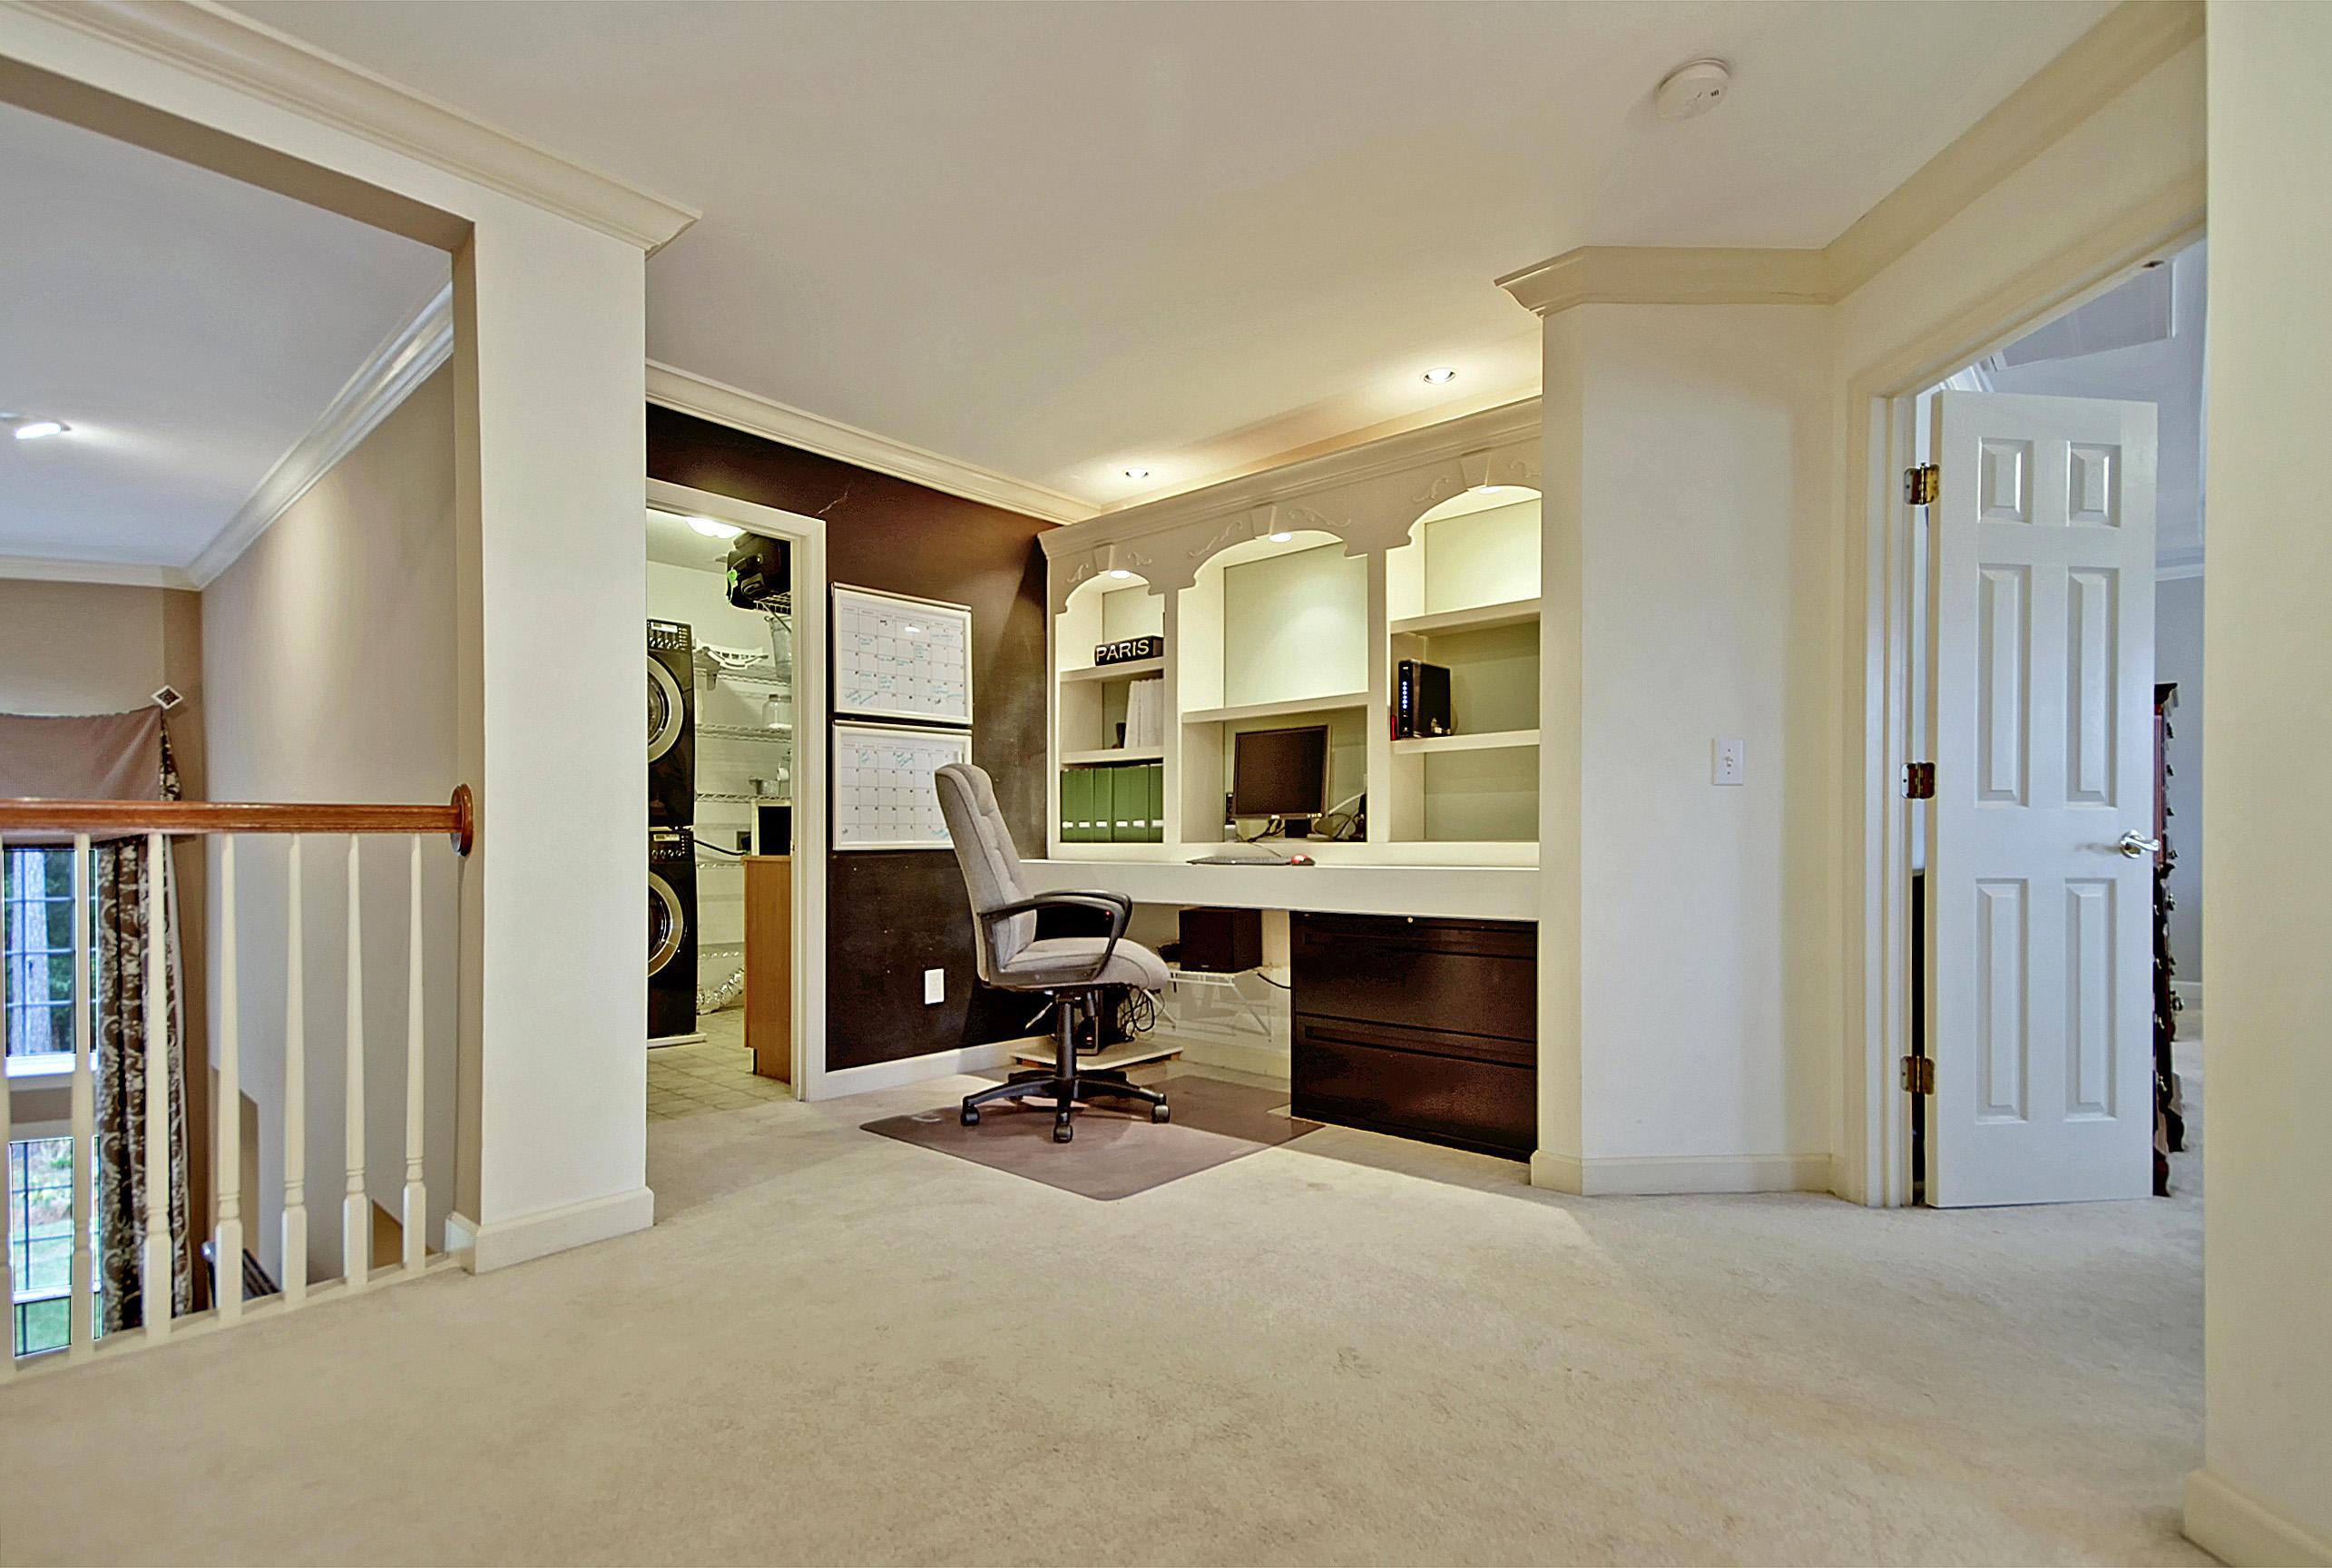 Dunes West Homes For Sale - 2449 Darts Cove, Mount Pleasant, SC - 44